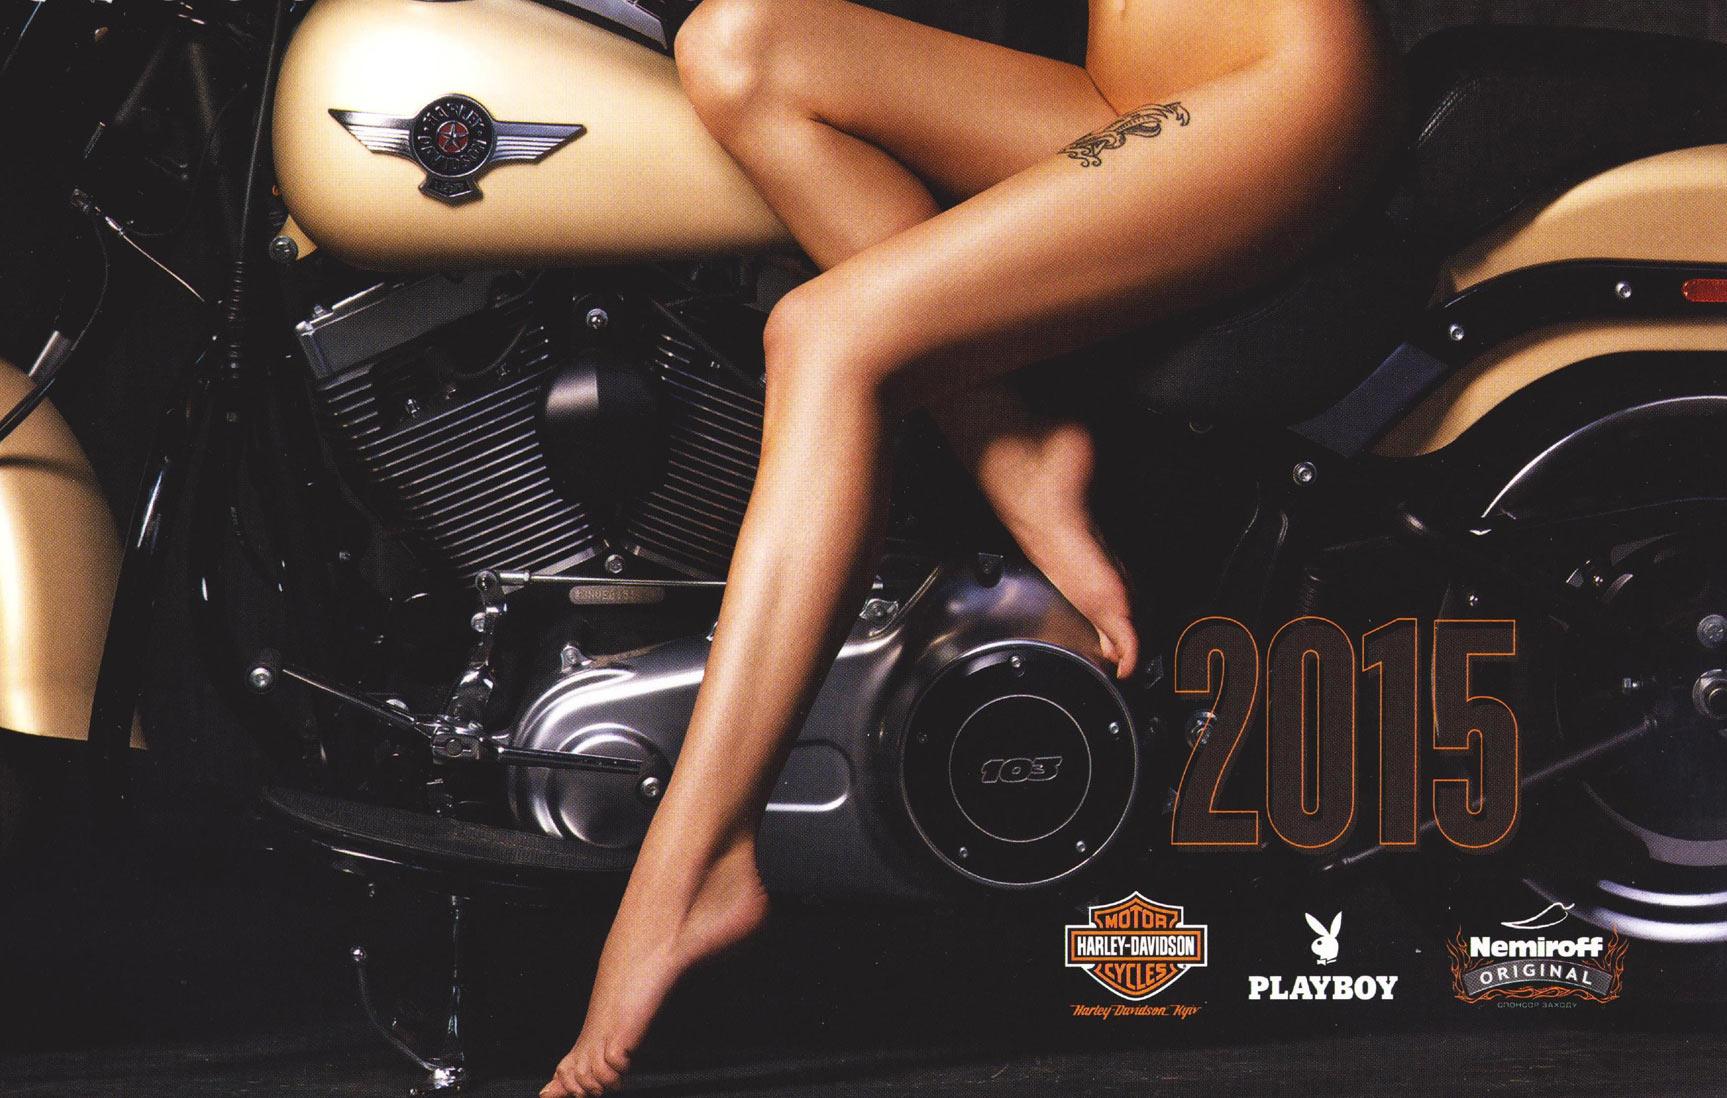 Календарь Playboy Украина - Harley-Davidson - Nemiroff 2015